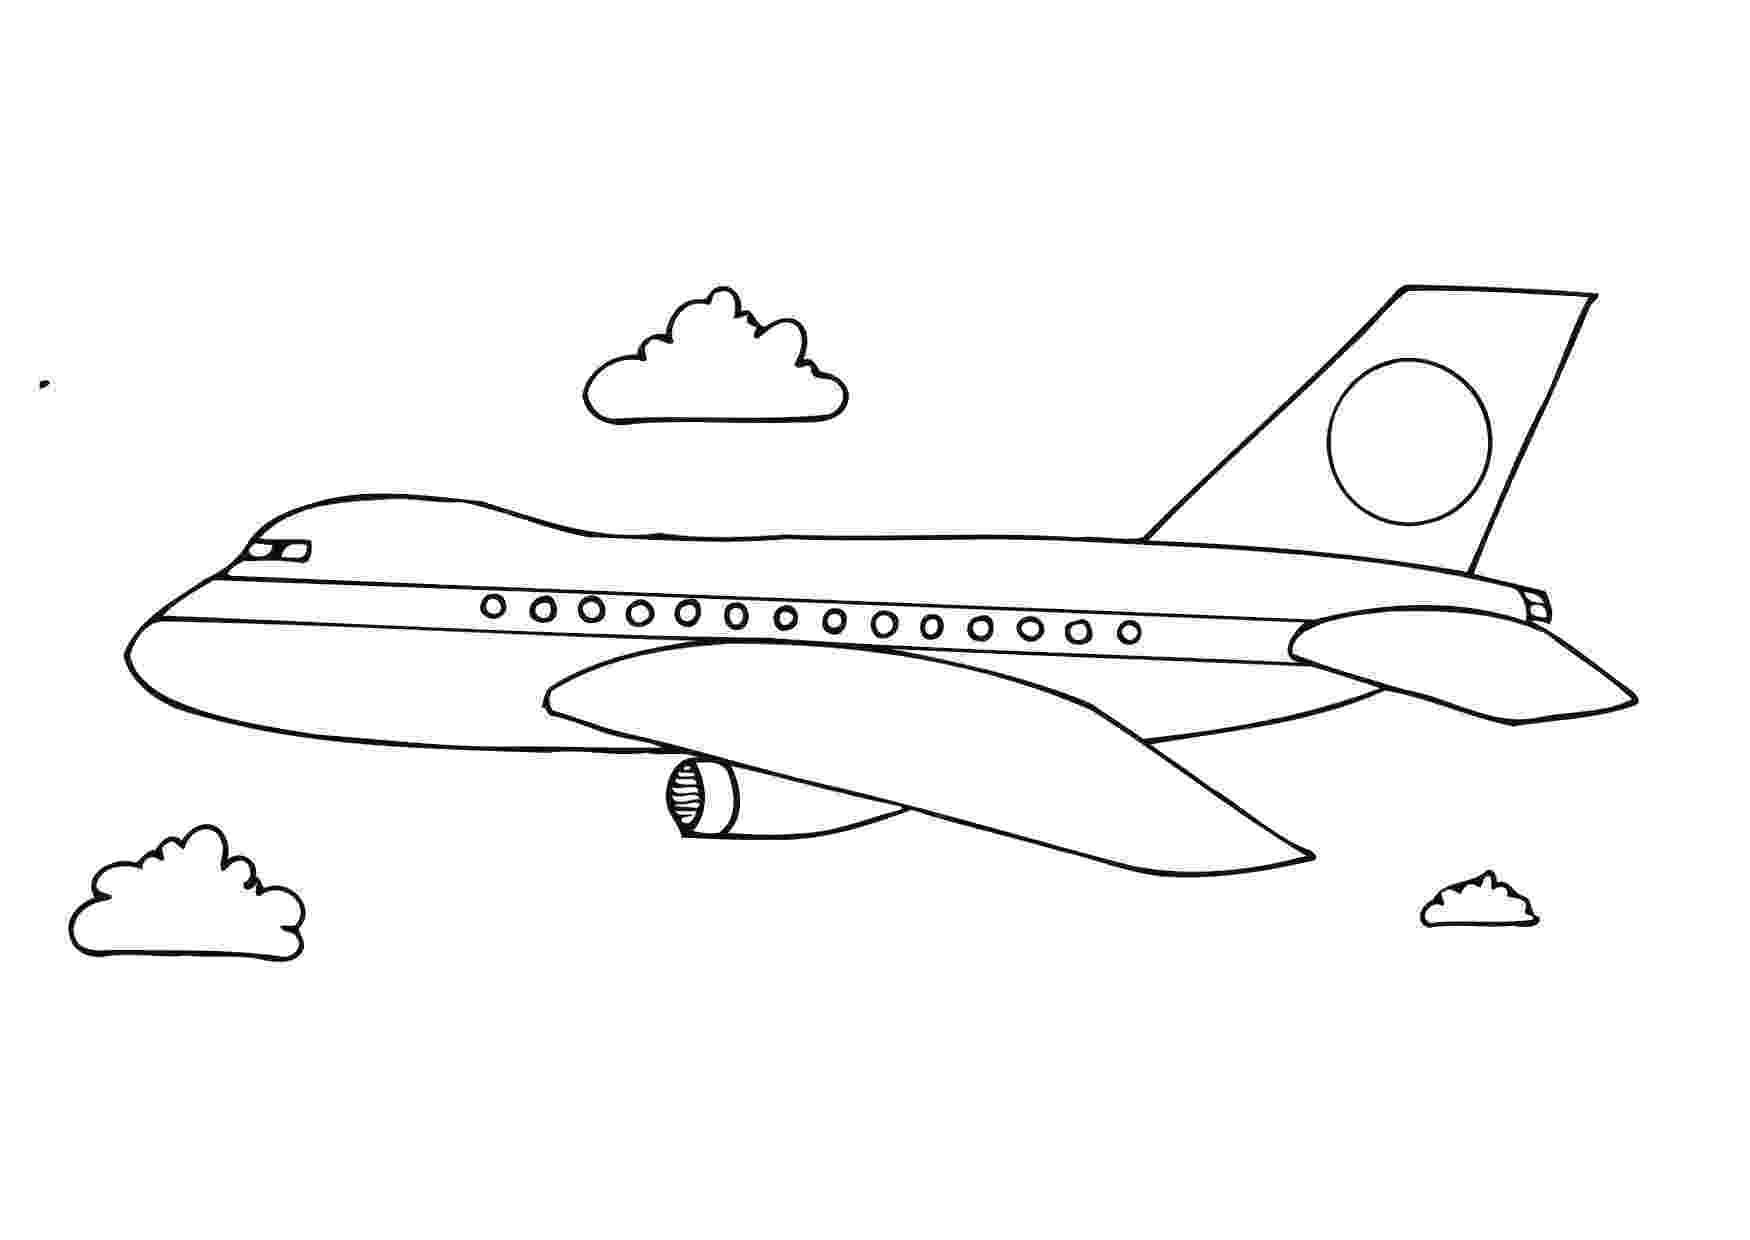 aeroplane coloring free printable airplane coloring pages for kids coloring aeroplane